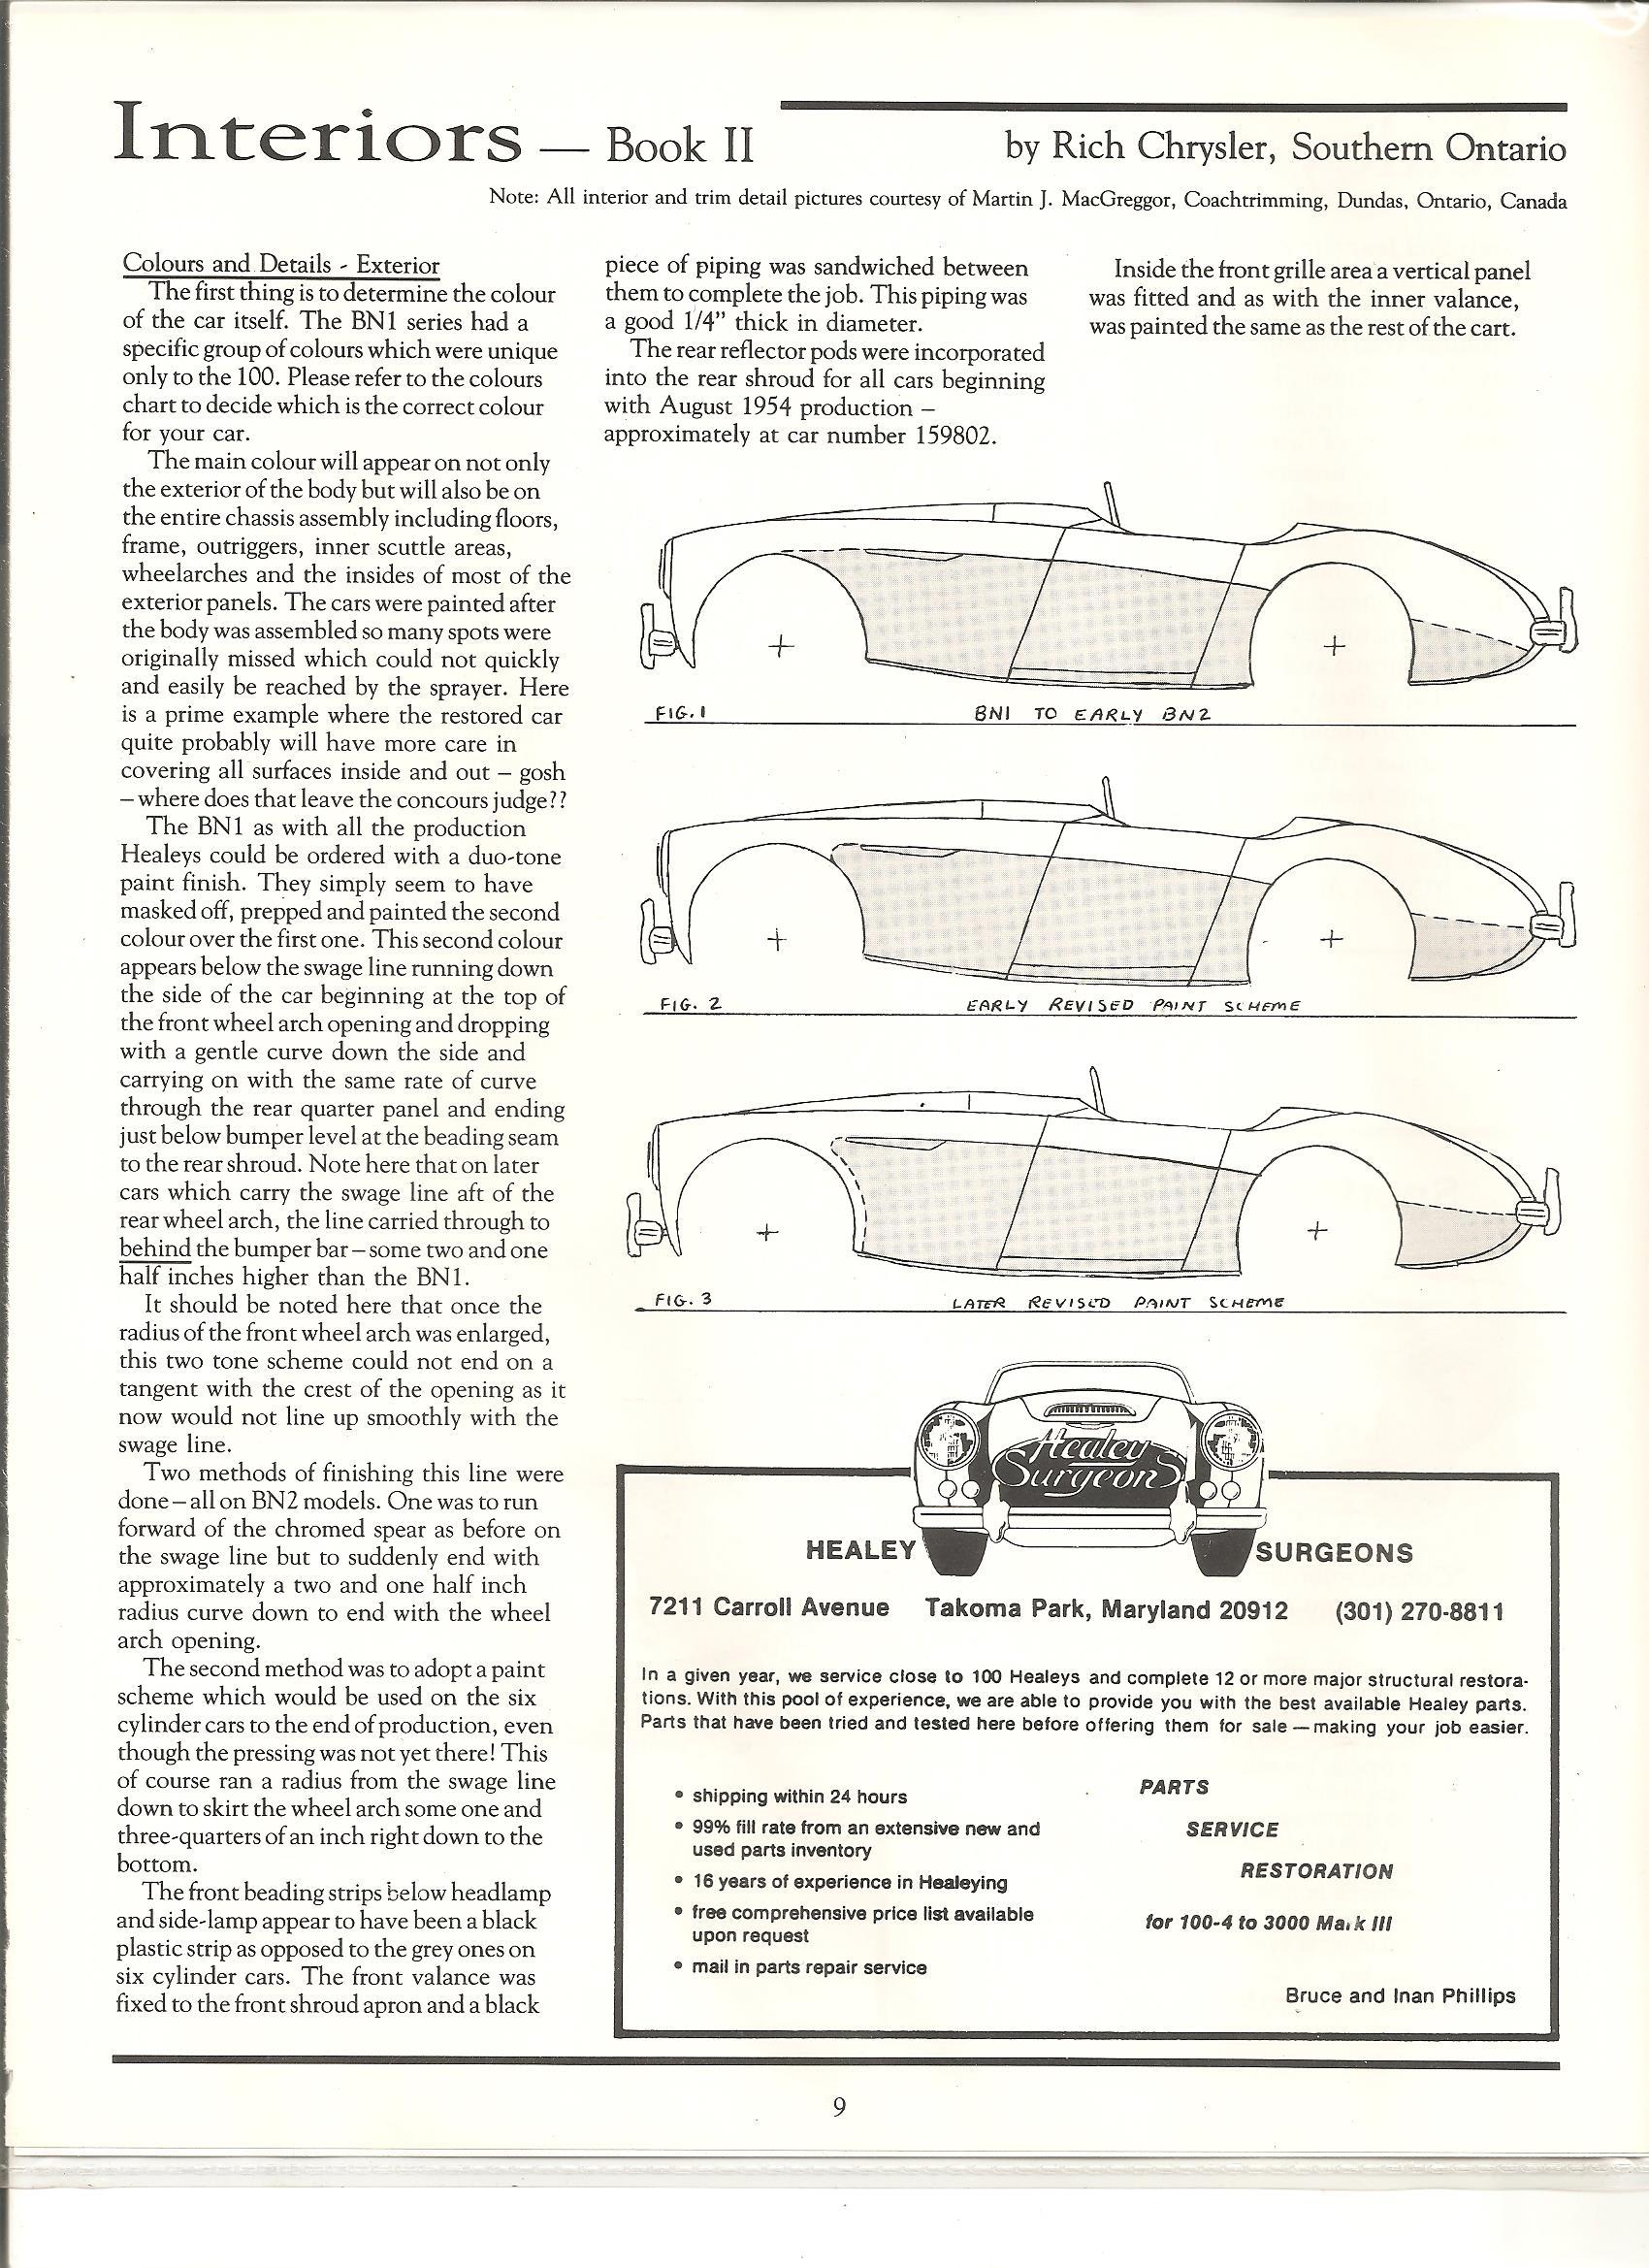 Austin Healey 3000 Wiring Diagram Great Installation Of Diagrams Technical Rh Healey6 Com 1960 Bt7 1962